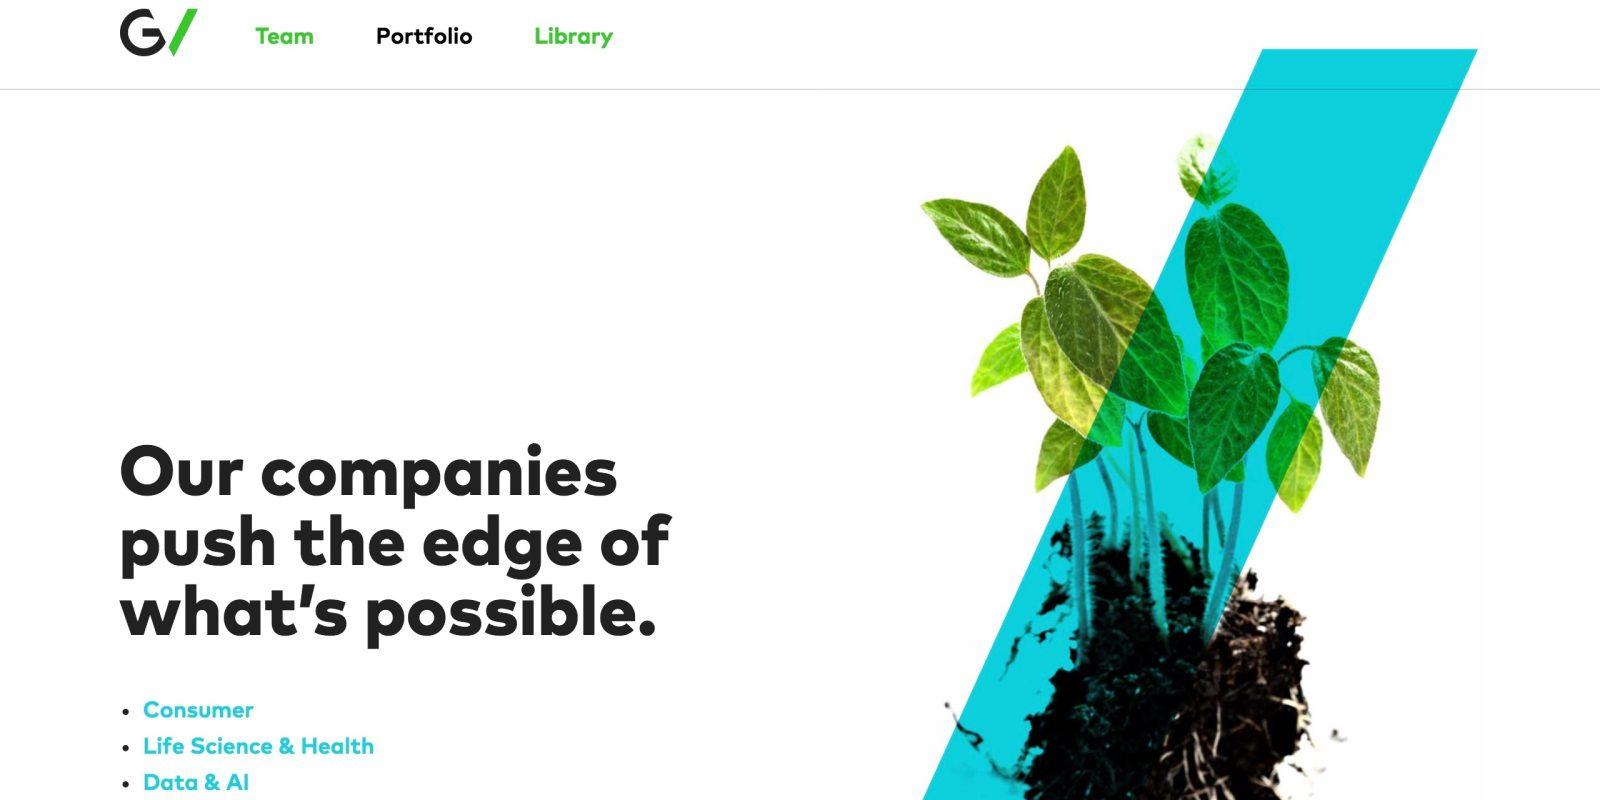 GV (Google Ventures) - 9to5Google